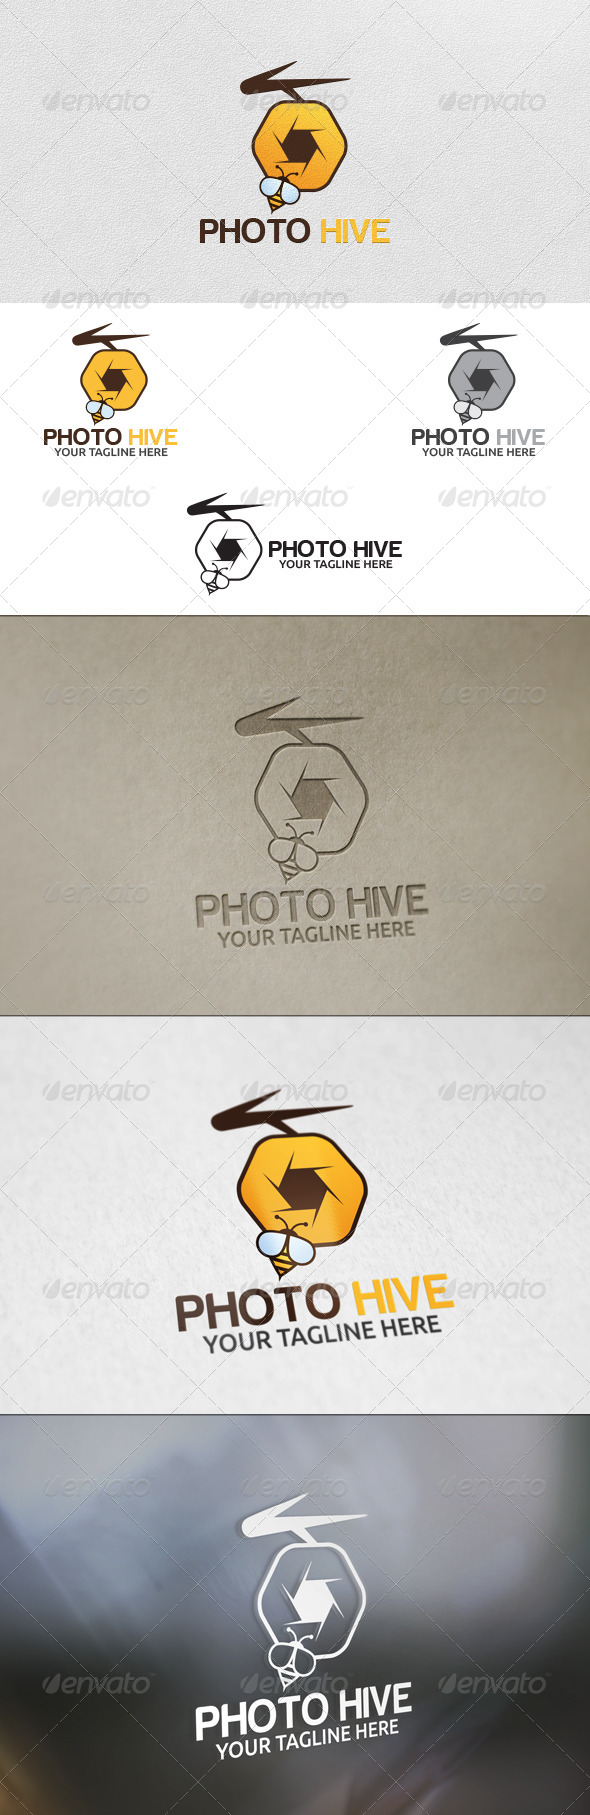 Photo Hive - Logo Template - Nature Logo Templates